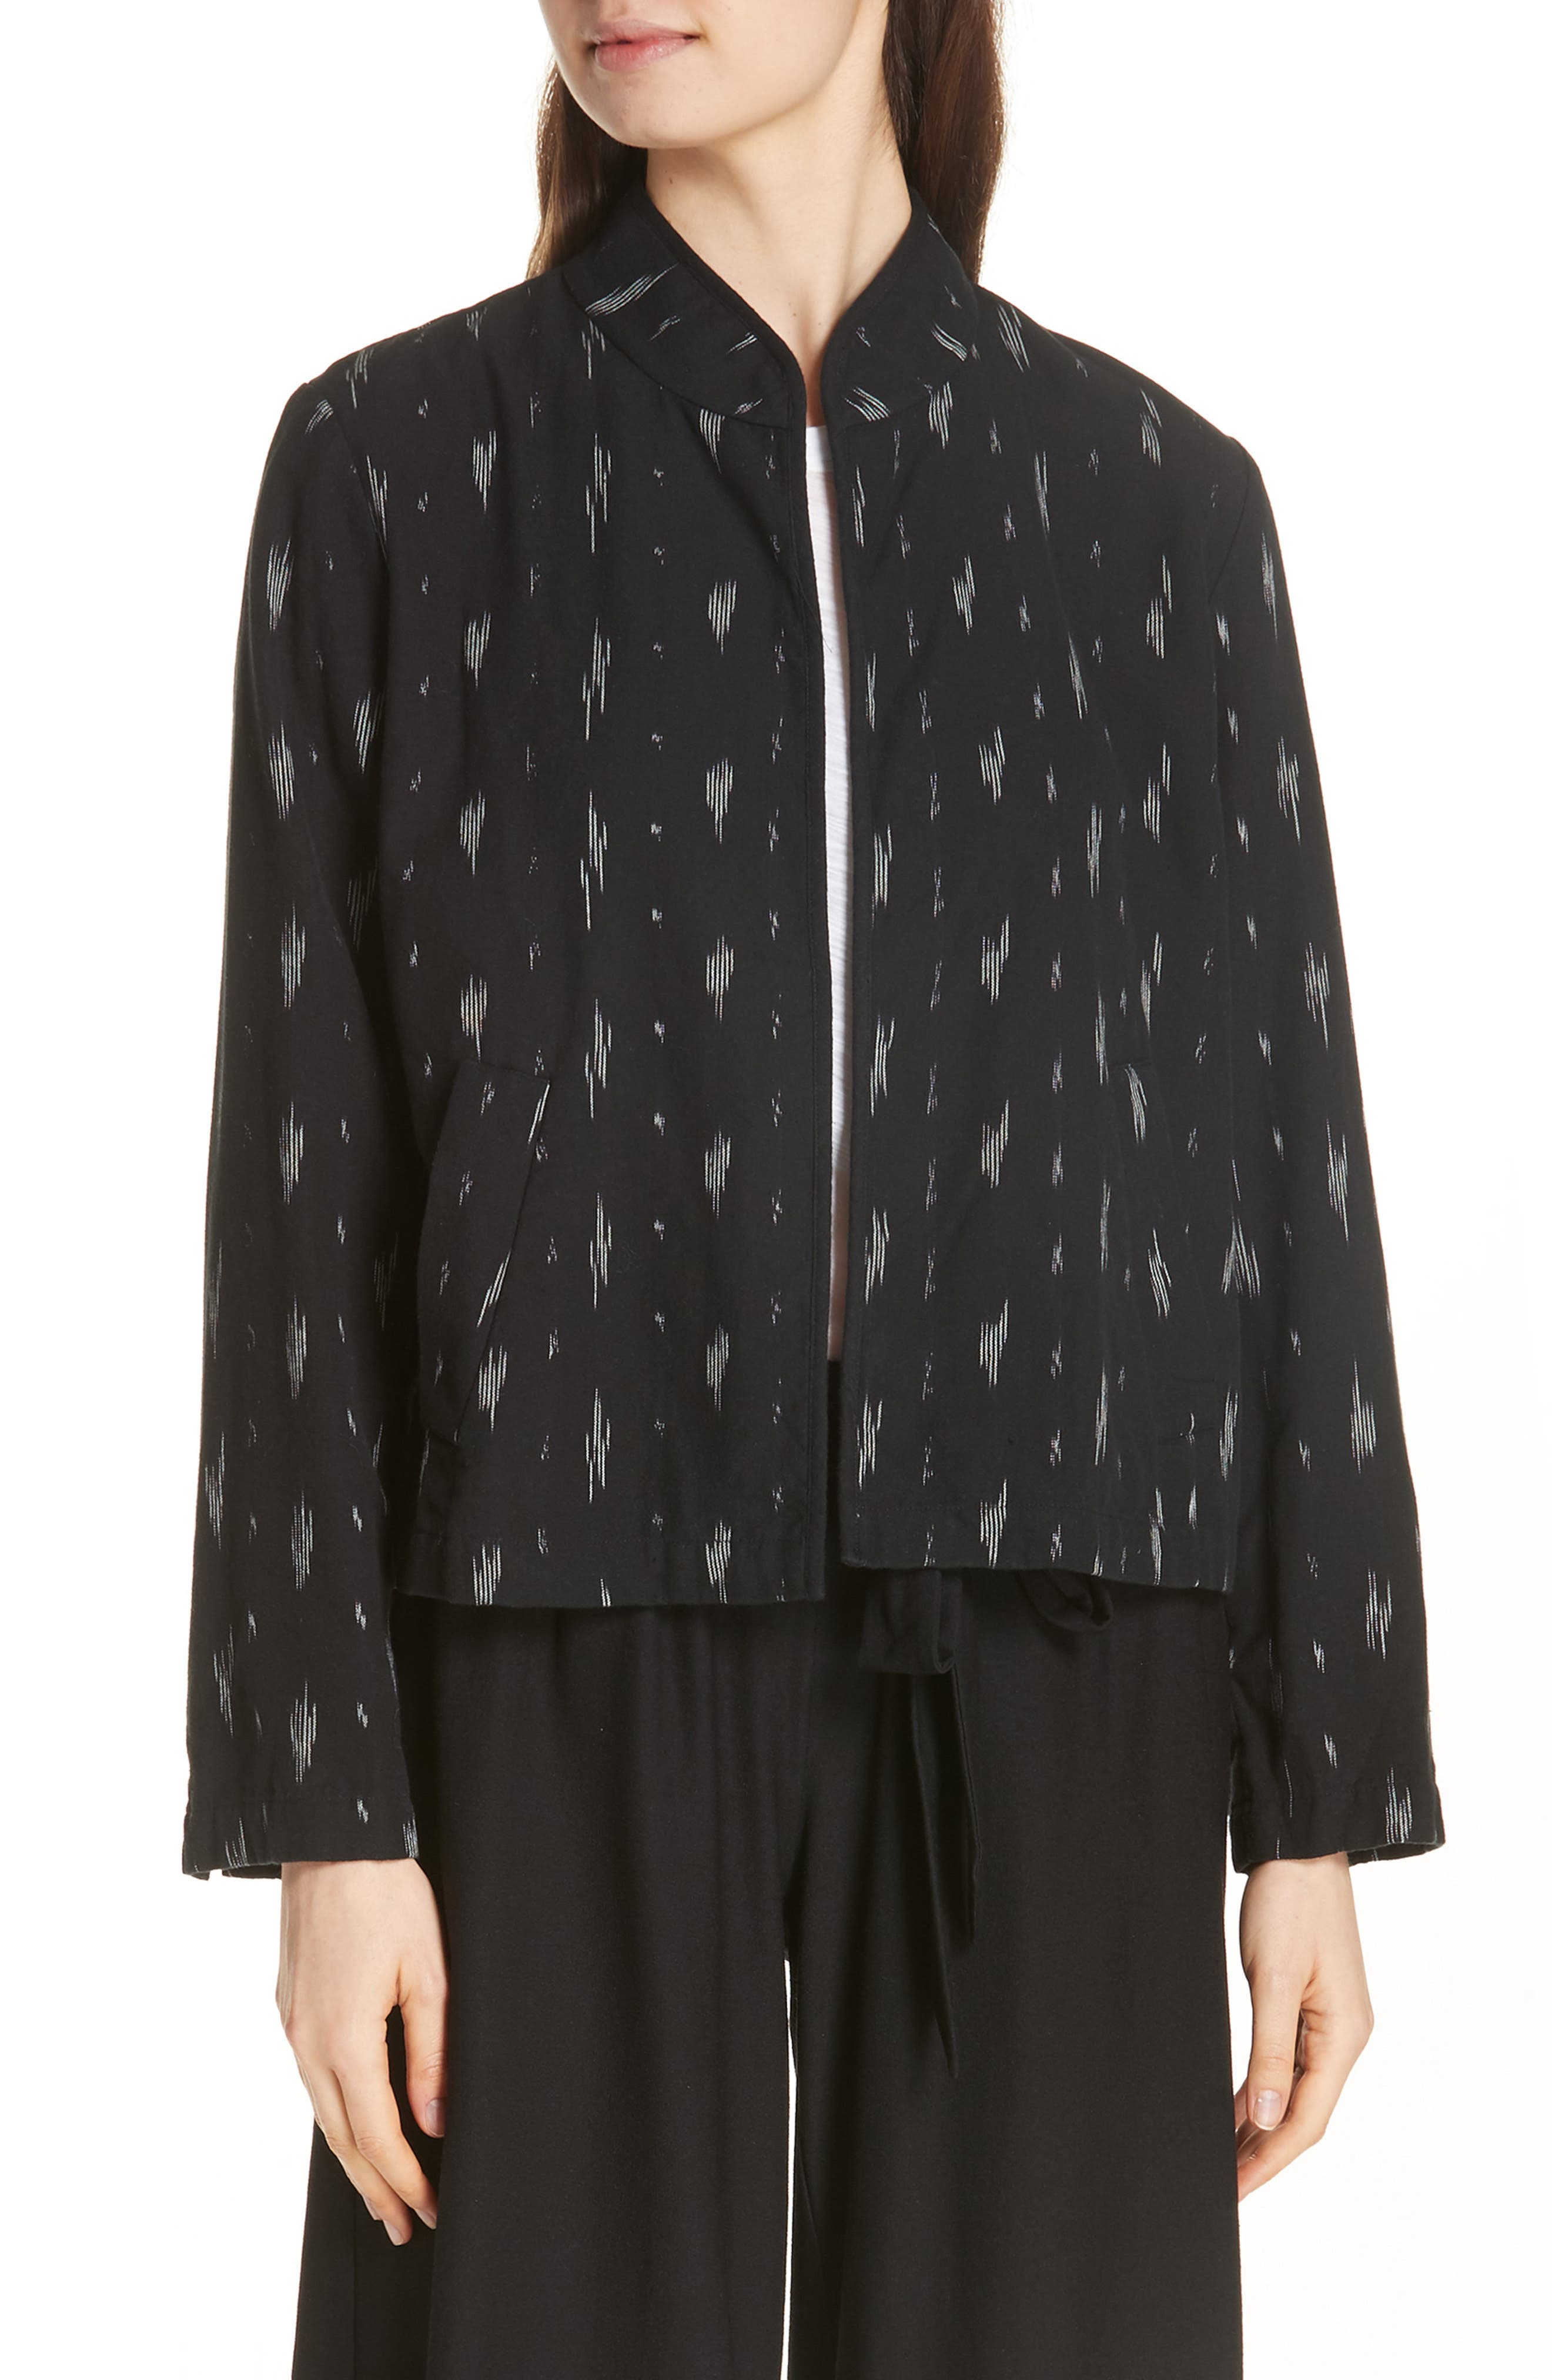 Organic Cotton Jacket,                             Main thumbnail 1, color,                             Black